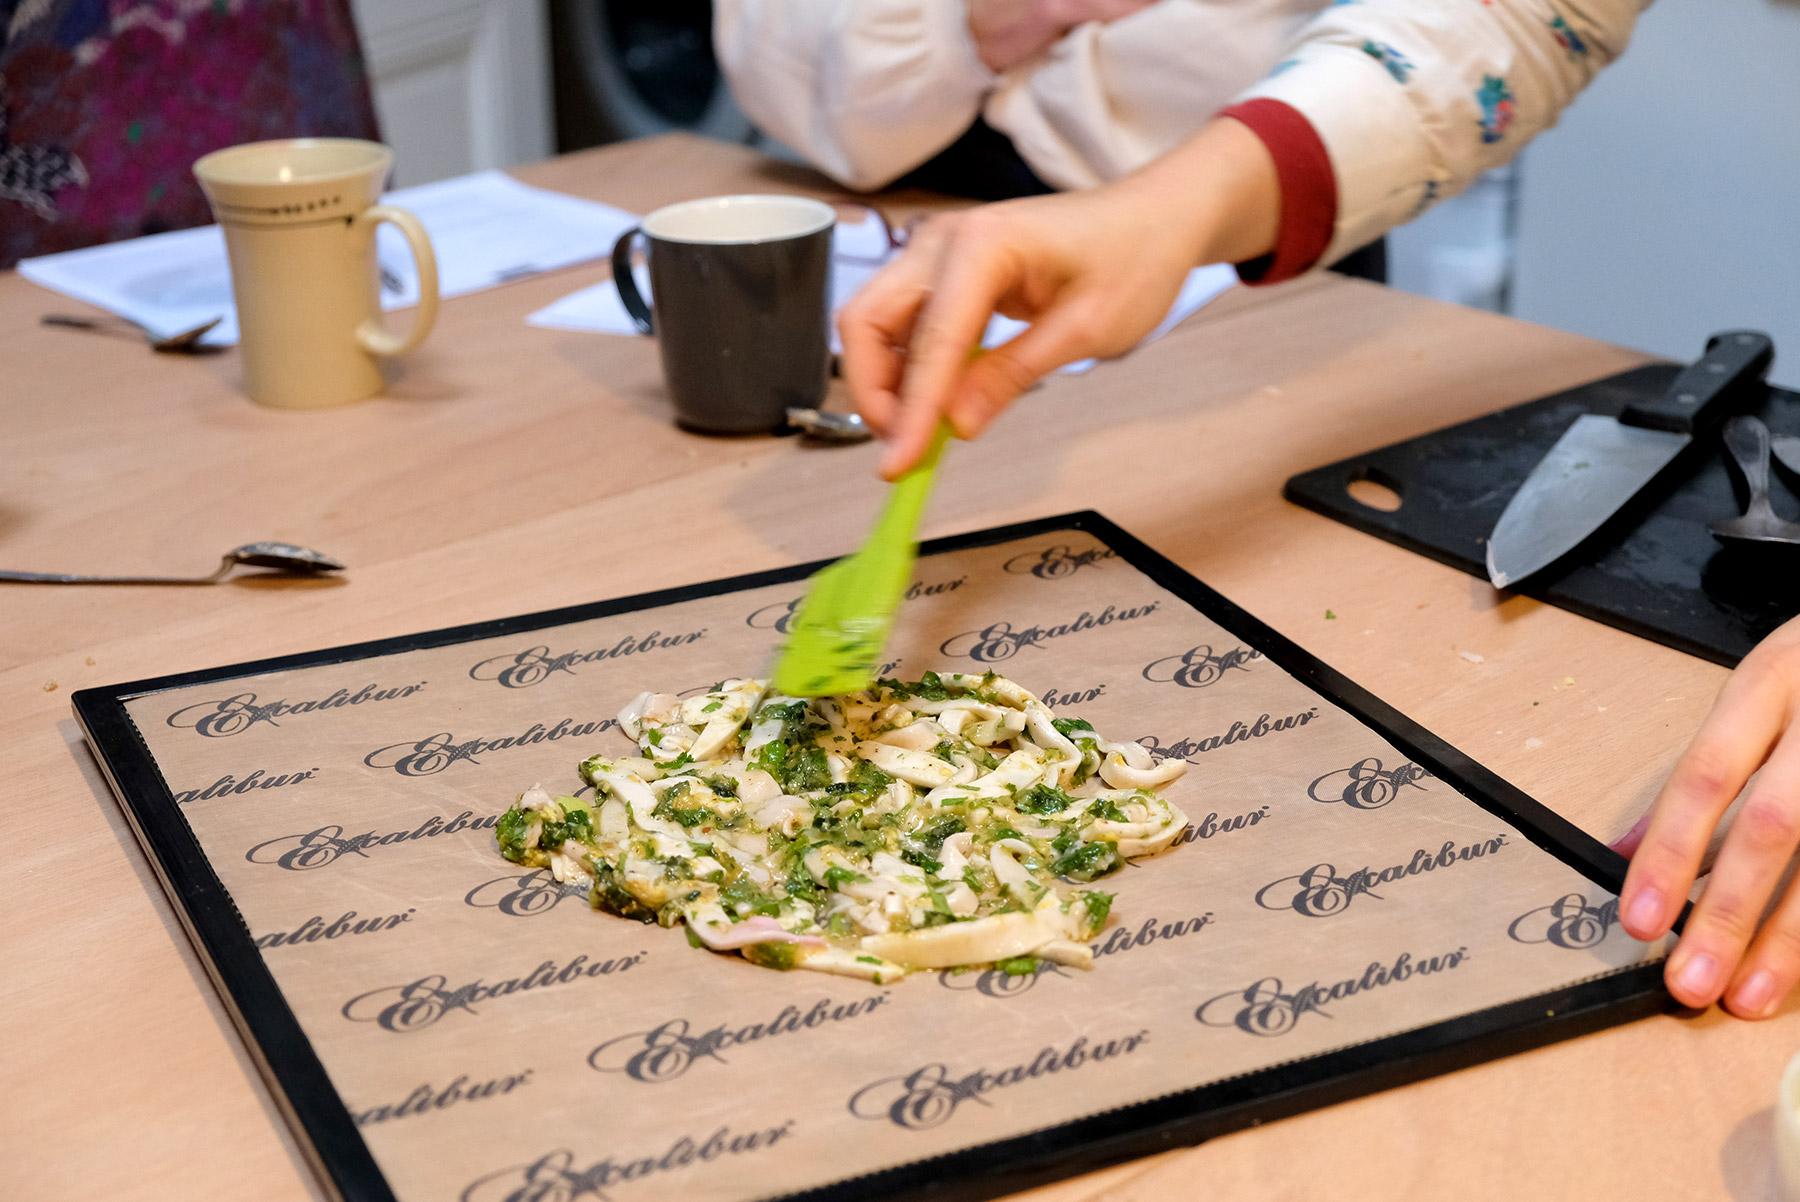 Atelier De La Cuisine Nantes blog-nantes-les-crawquantes-cuisine-crue-vegan10 - nantaise.fr